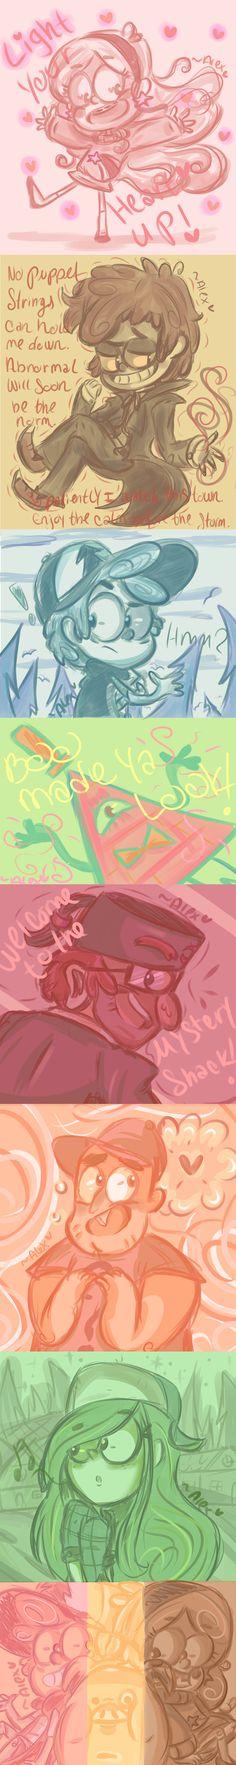 Gravity Falls flavor palettes by chibiirose on DeviantArt Gravity Falls Fan Art, Gravity Falls Comics, Dipper Y Mabel, Desenhos Gravity Falls, Bipper, Reverse Falls, Billdip, Stay Weird, Cool Cartoons